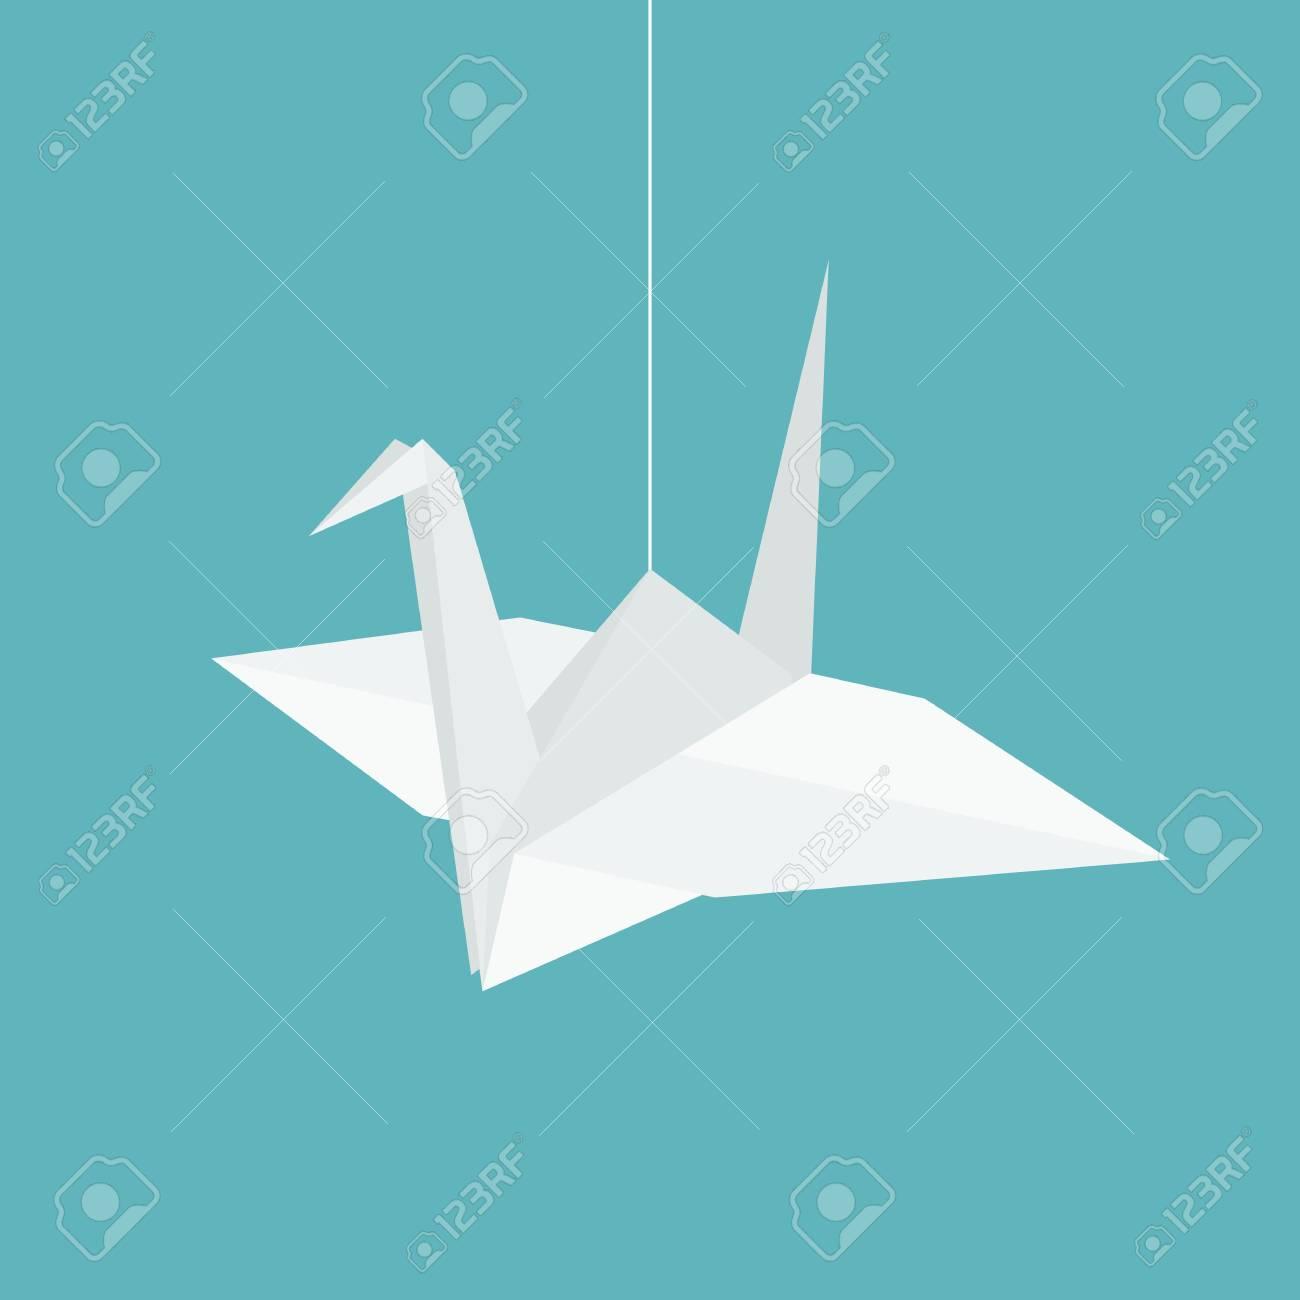 Origami Flying Bird Image & Photo (Free Trial) | Bigstock | 1300x1300